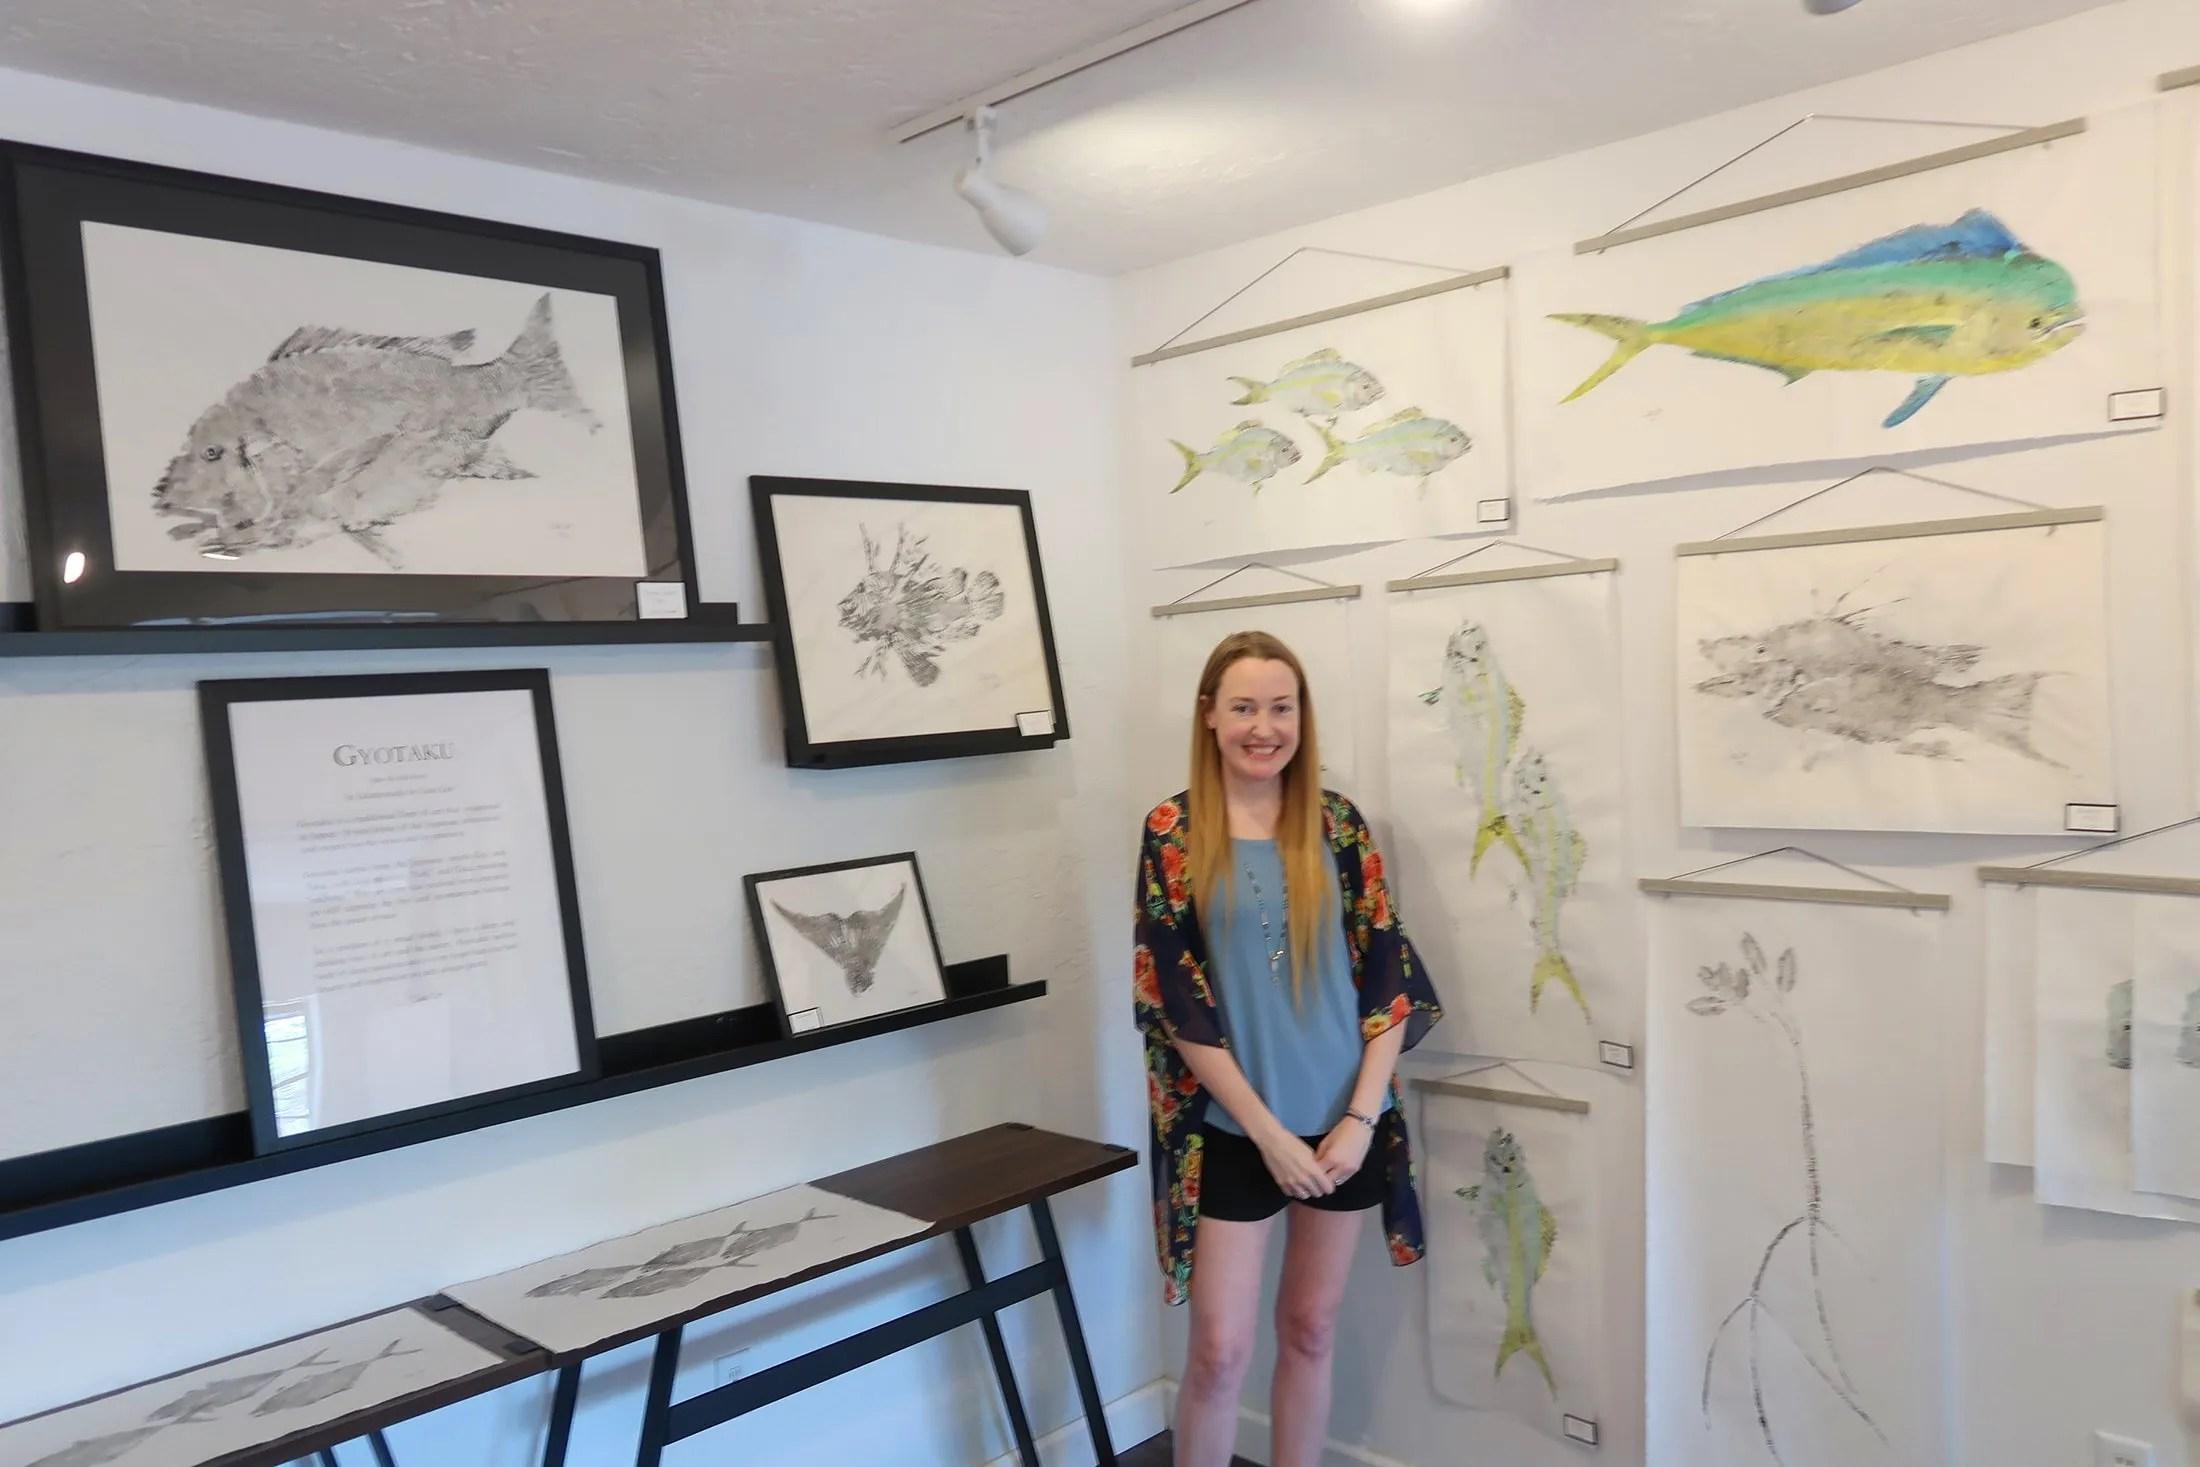 Lisa Lee creates and sells Gyotaku prints in her Gallery of the Arts studio in Tavernier, Fla. (Craig Davis/Craigslegztravels.com)